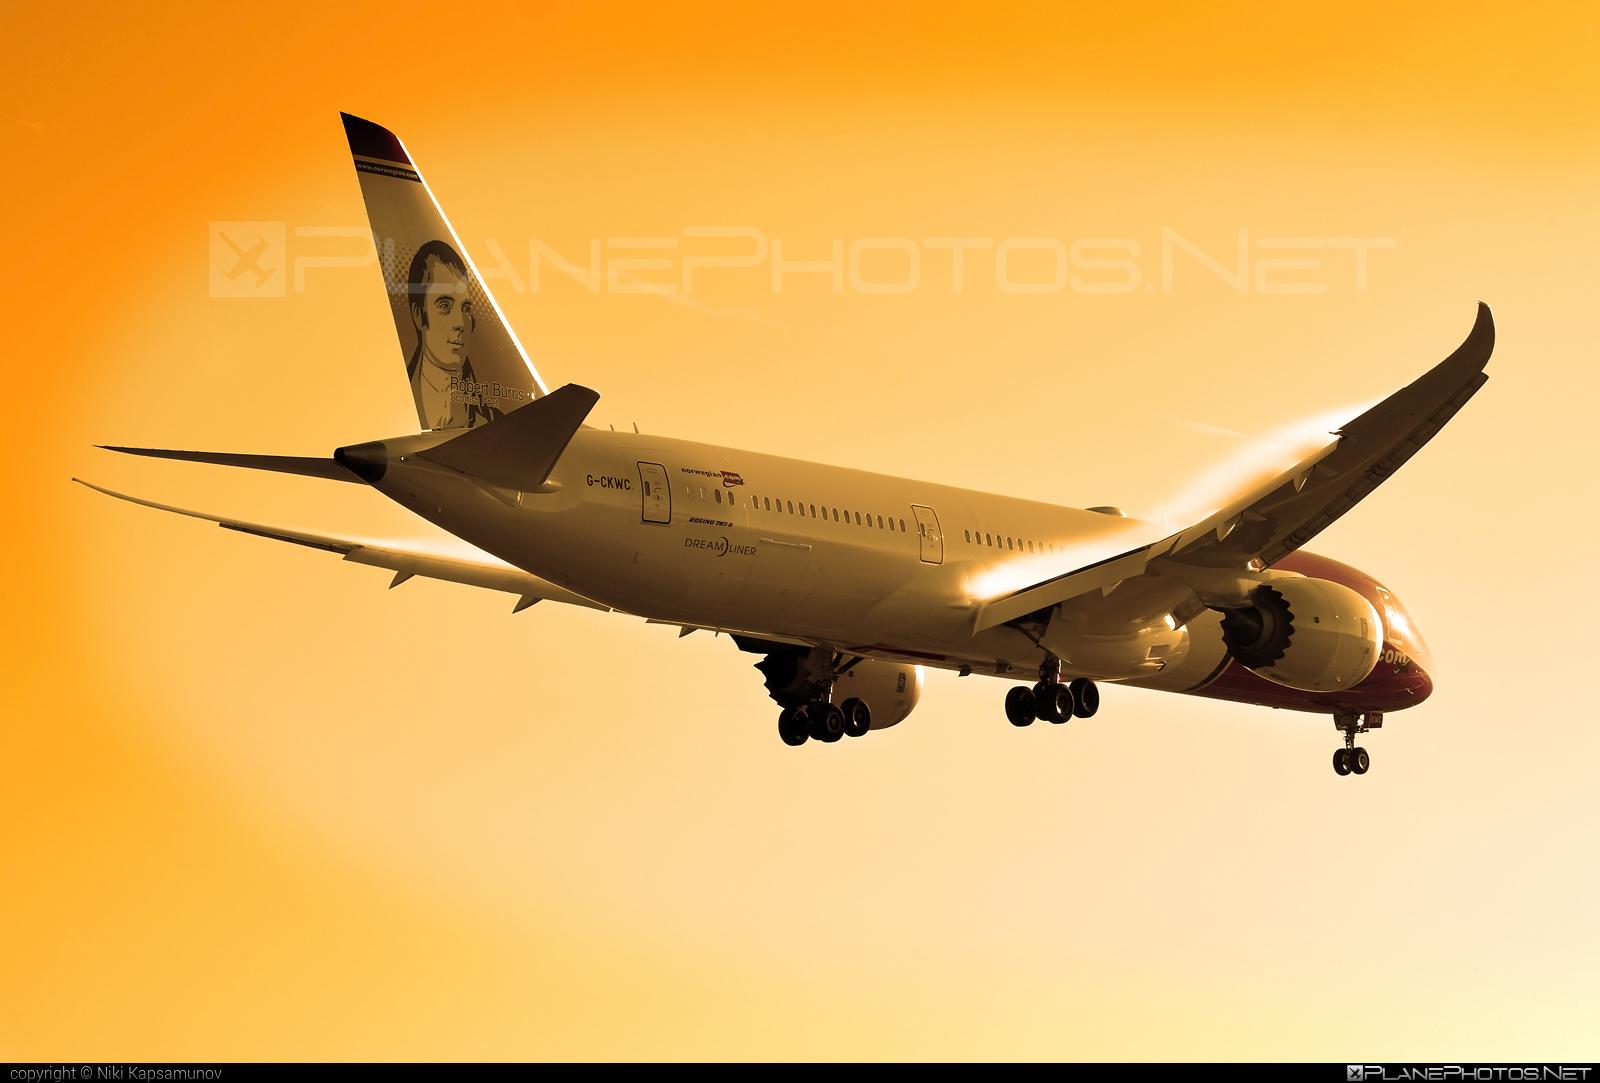 Norwegian Air UK Boeing 787-9 Dreamliner - G-CKWC #b787 #boeing #boeing787 #dreamliner #norwegian #norwegianair #norwegianairuk